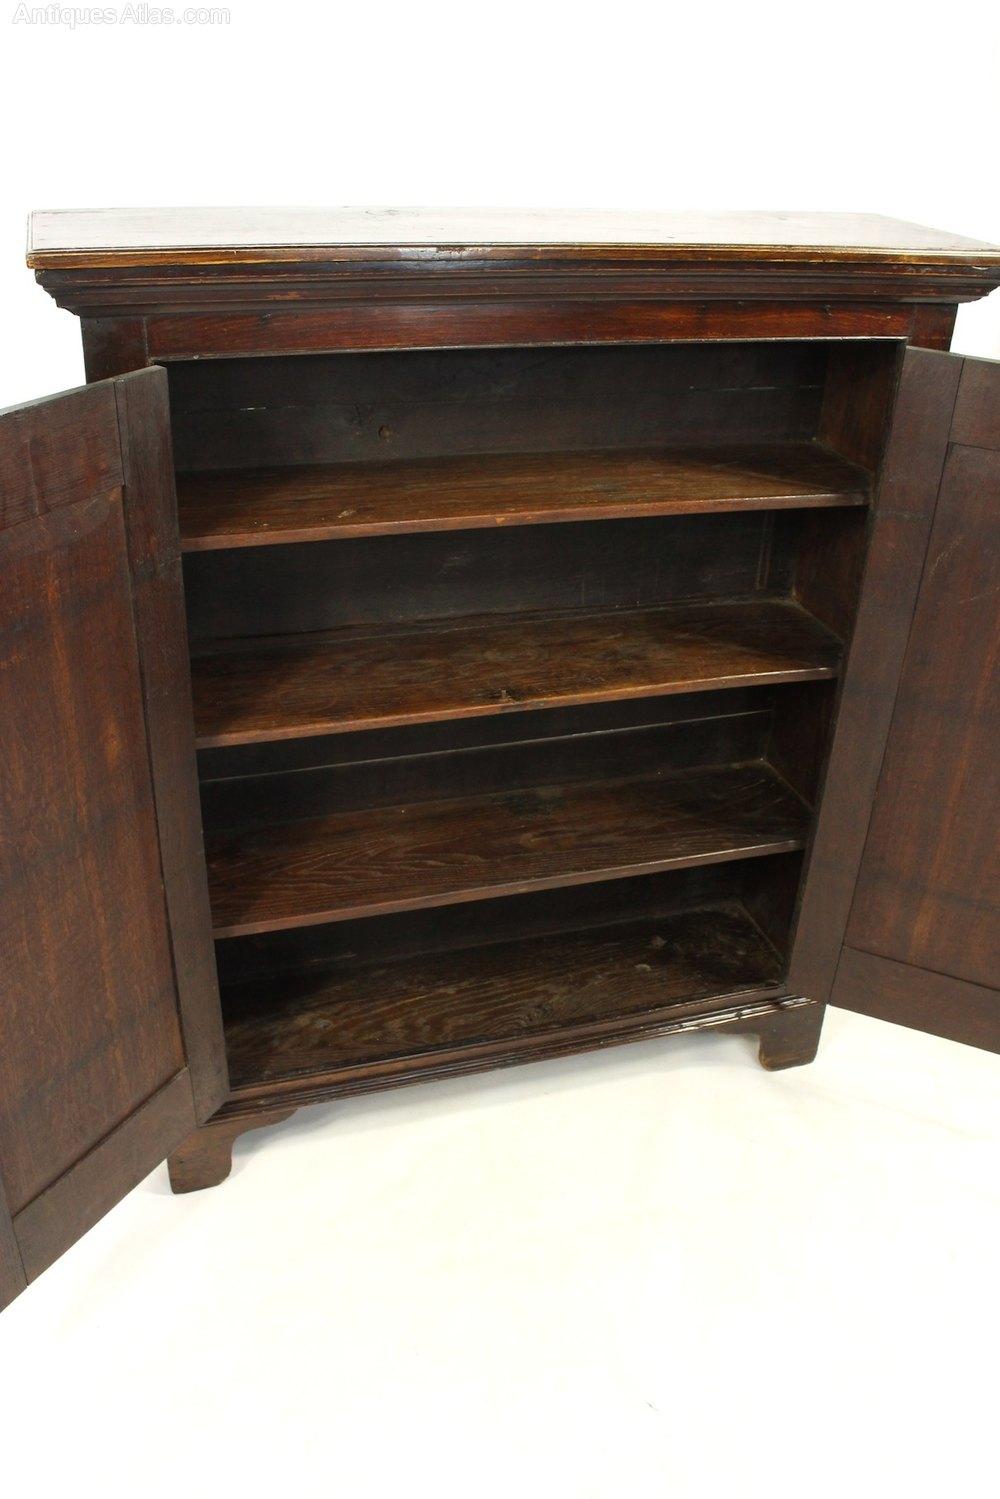 Georgian Oak Cabinet Cupboard Bookcase Antiques Atlas